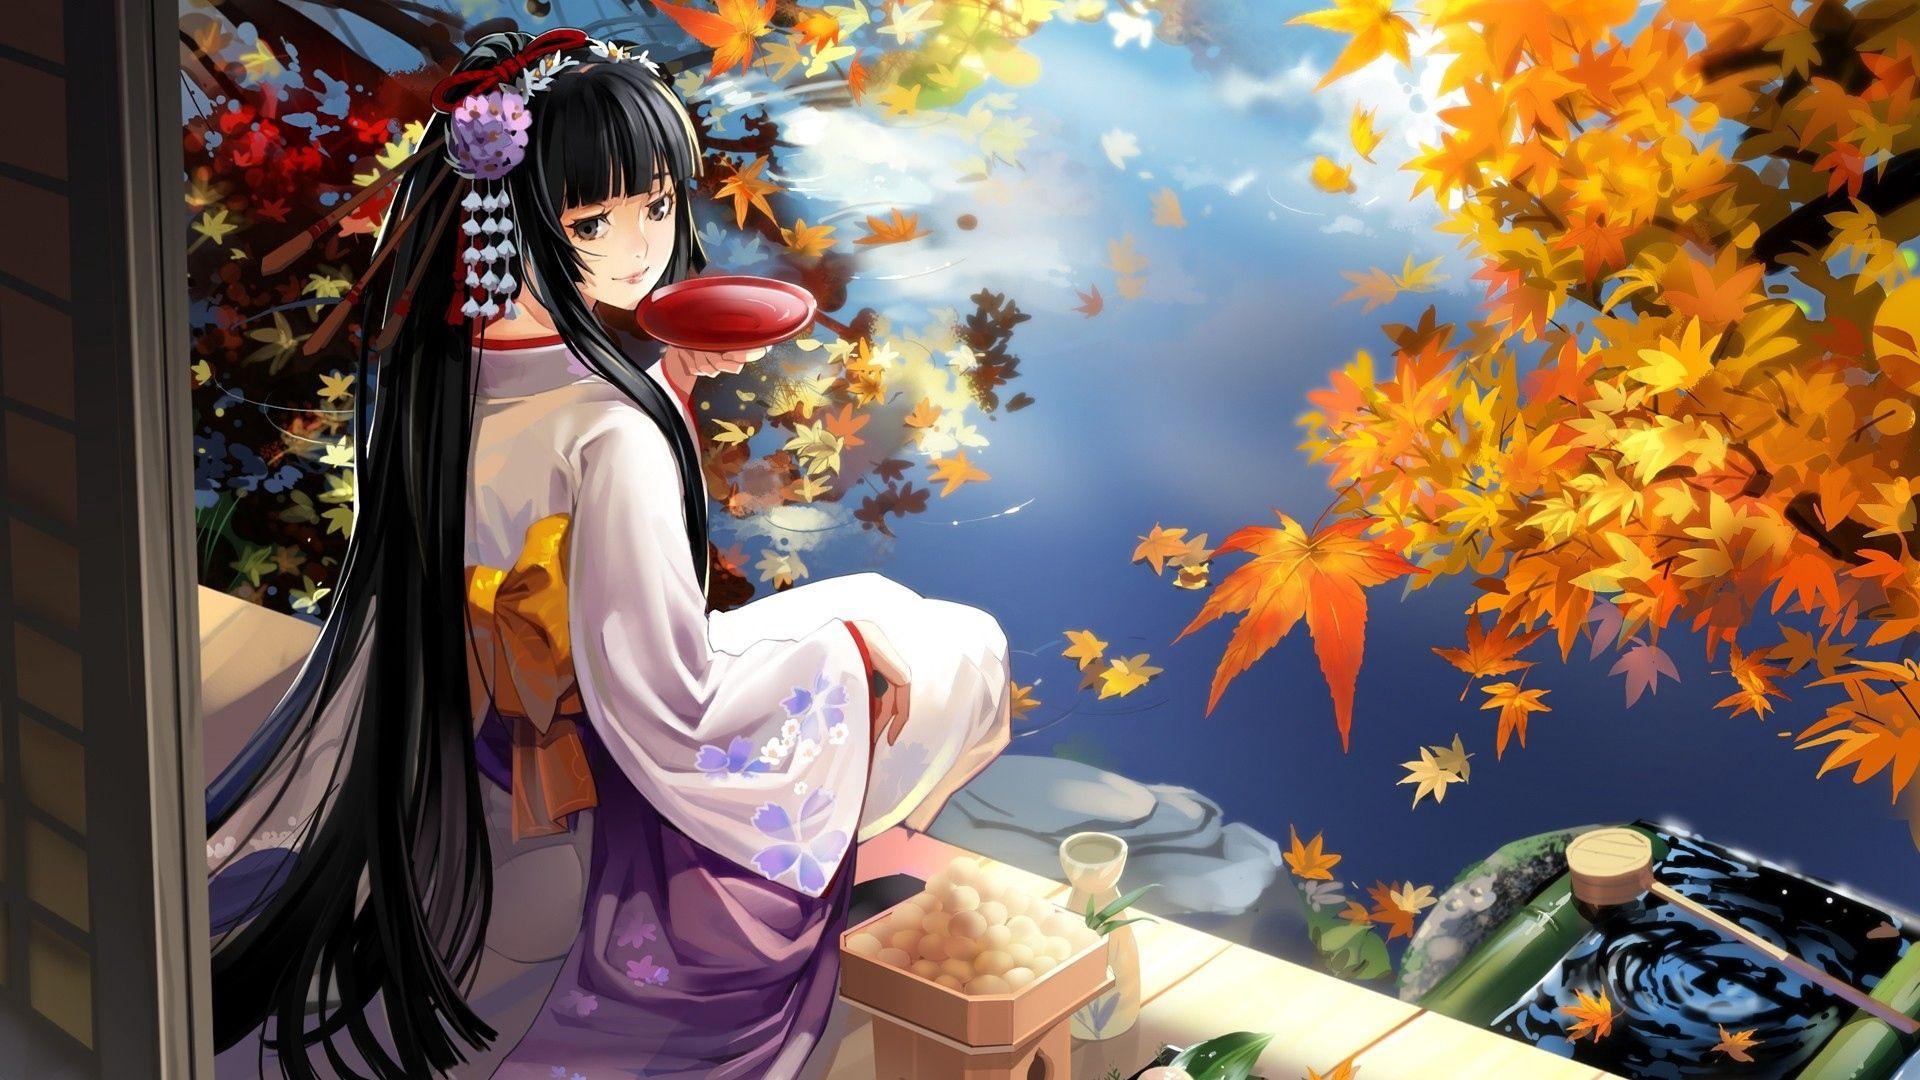 Hd Anime laptop background